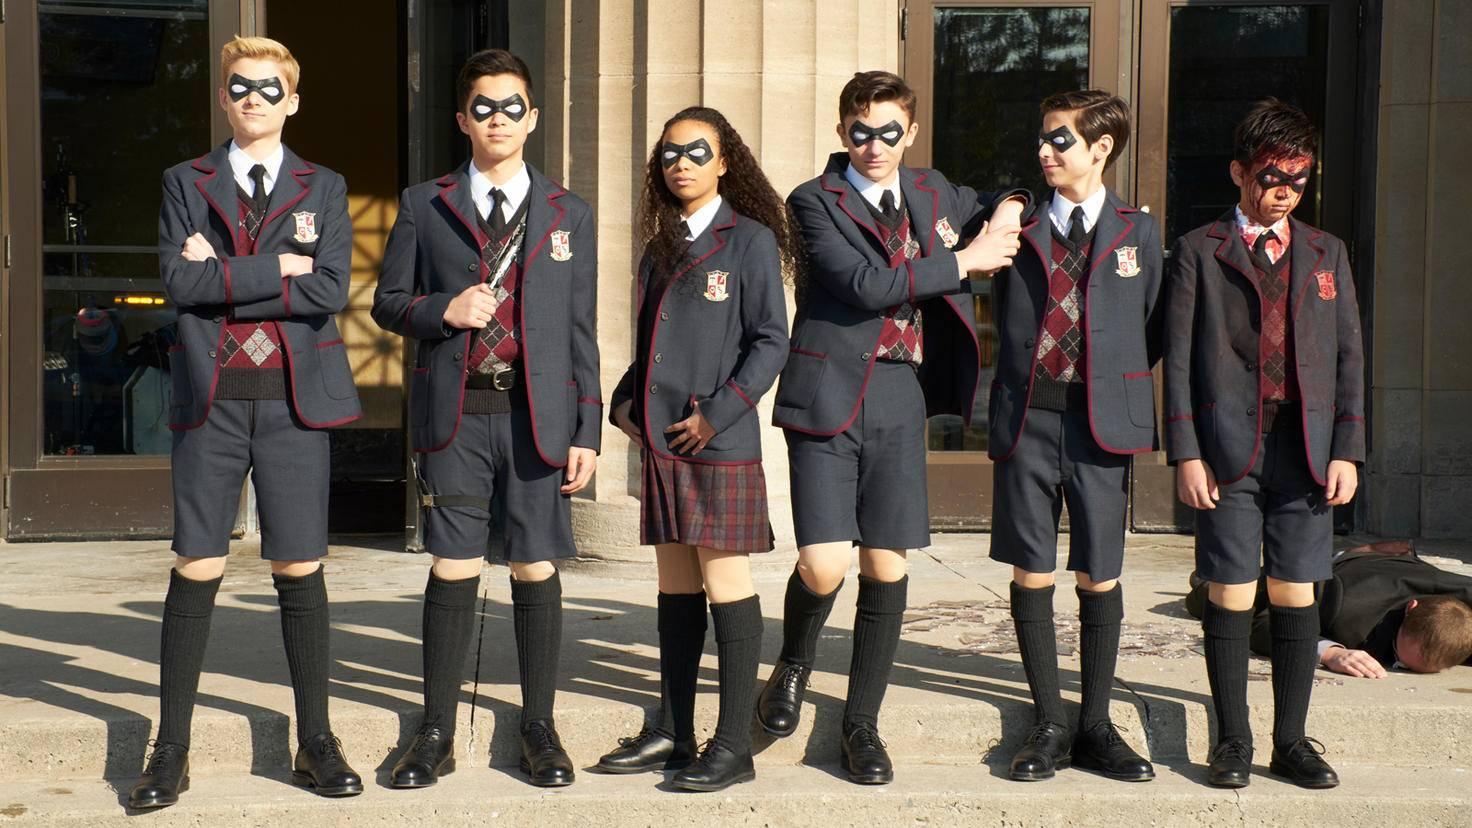 Umbrella Academy 002 Christos Kalohoridis Netflix